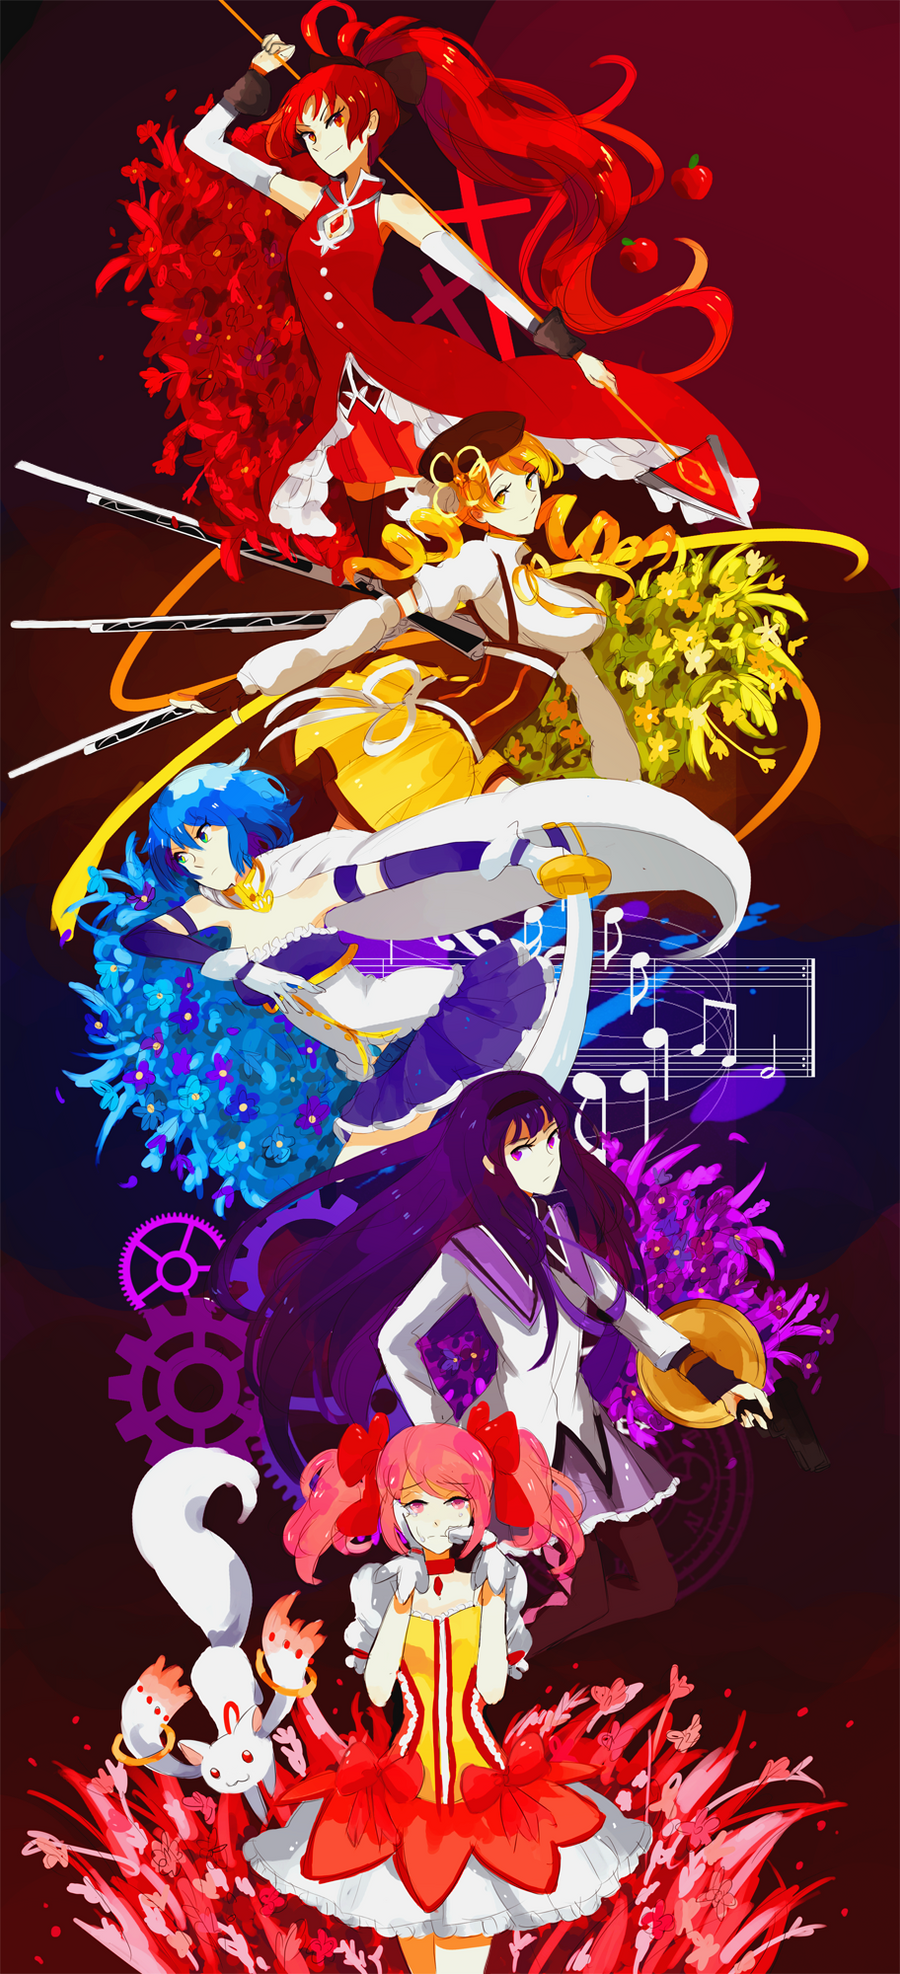 MADOKA MAGICA by Kite-Mitiko